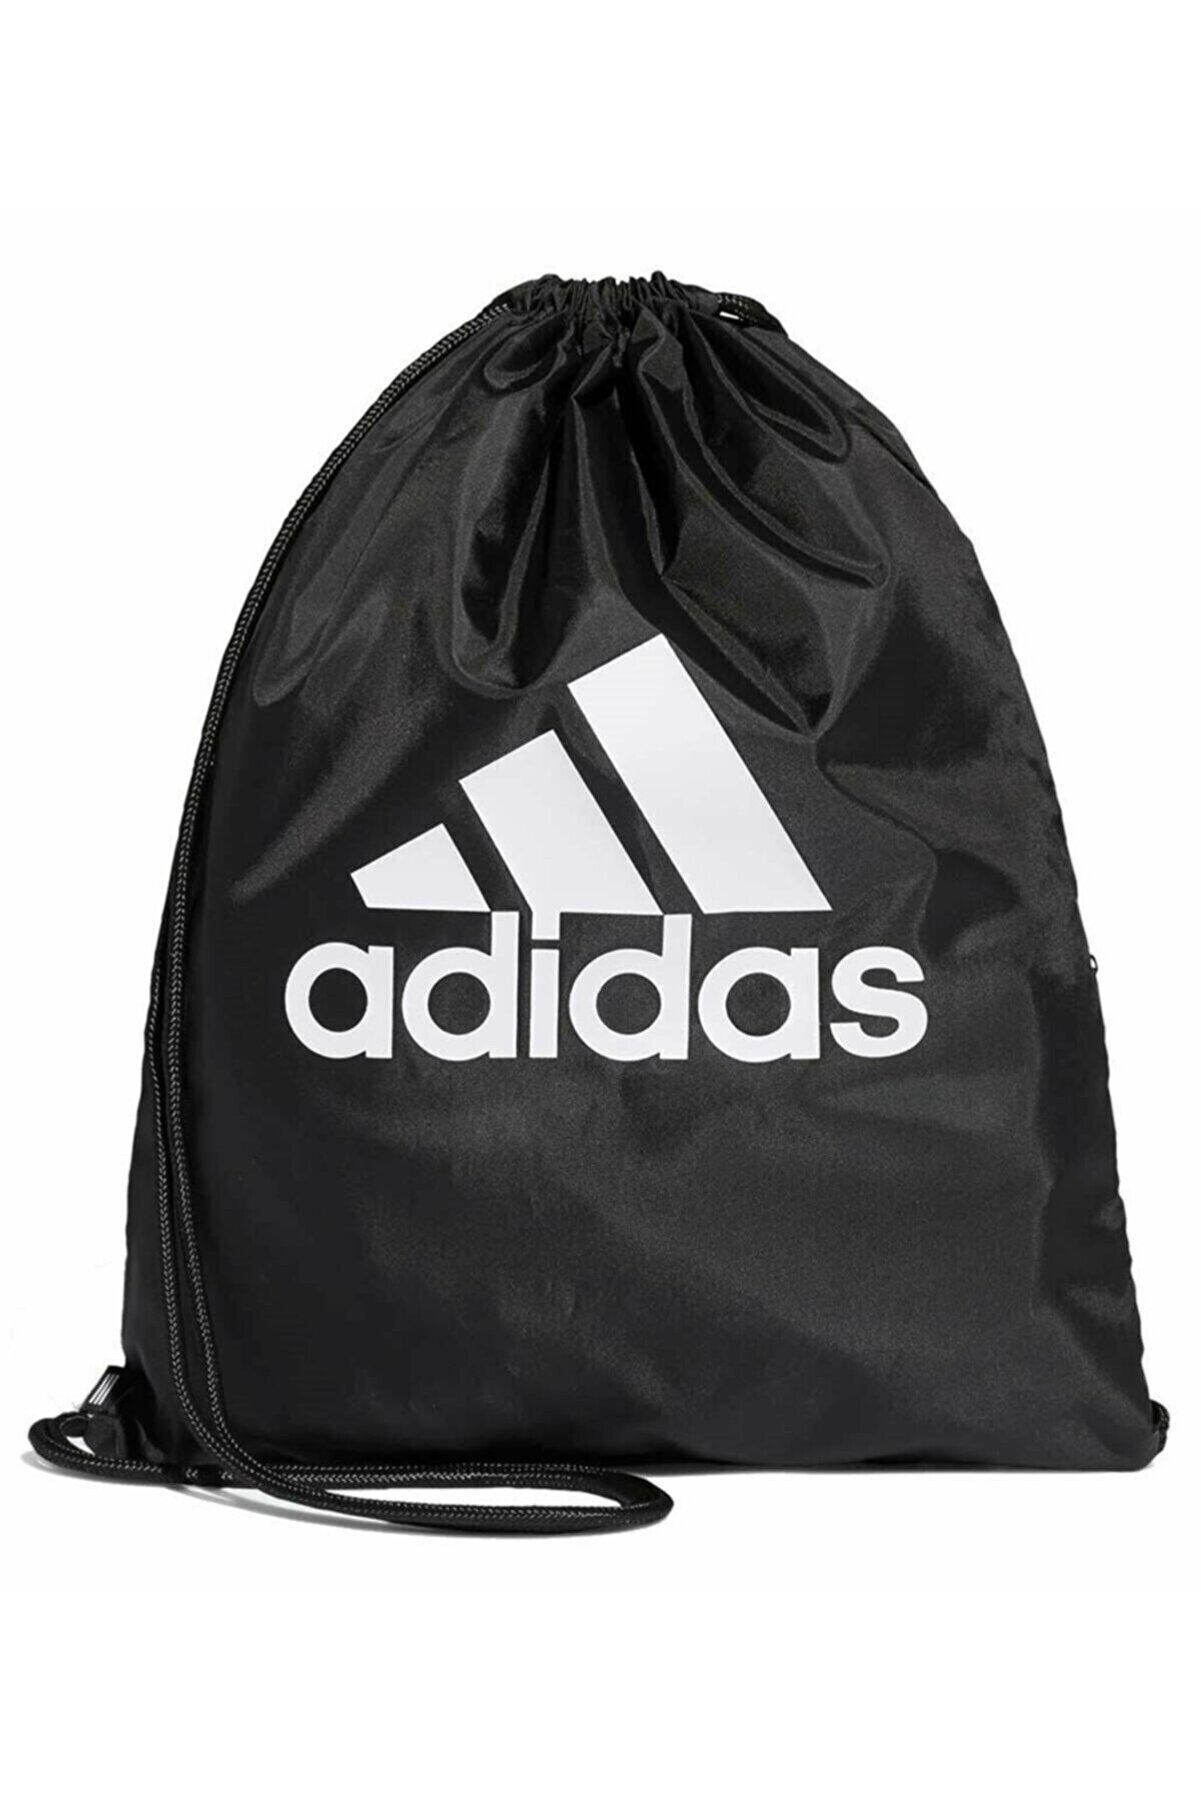 adidas Gymsack Spor Çantası Siyah - Standart 37 cm x 47 cm.